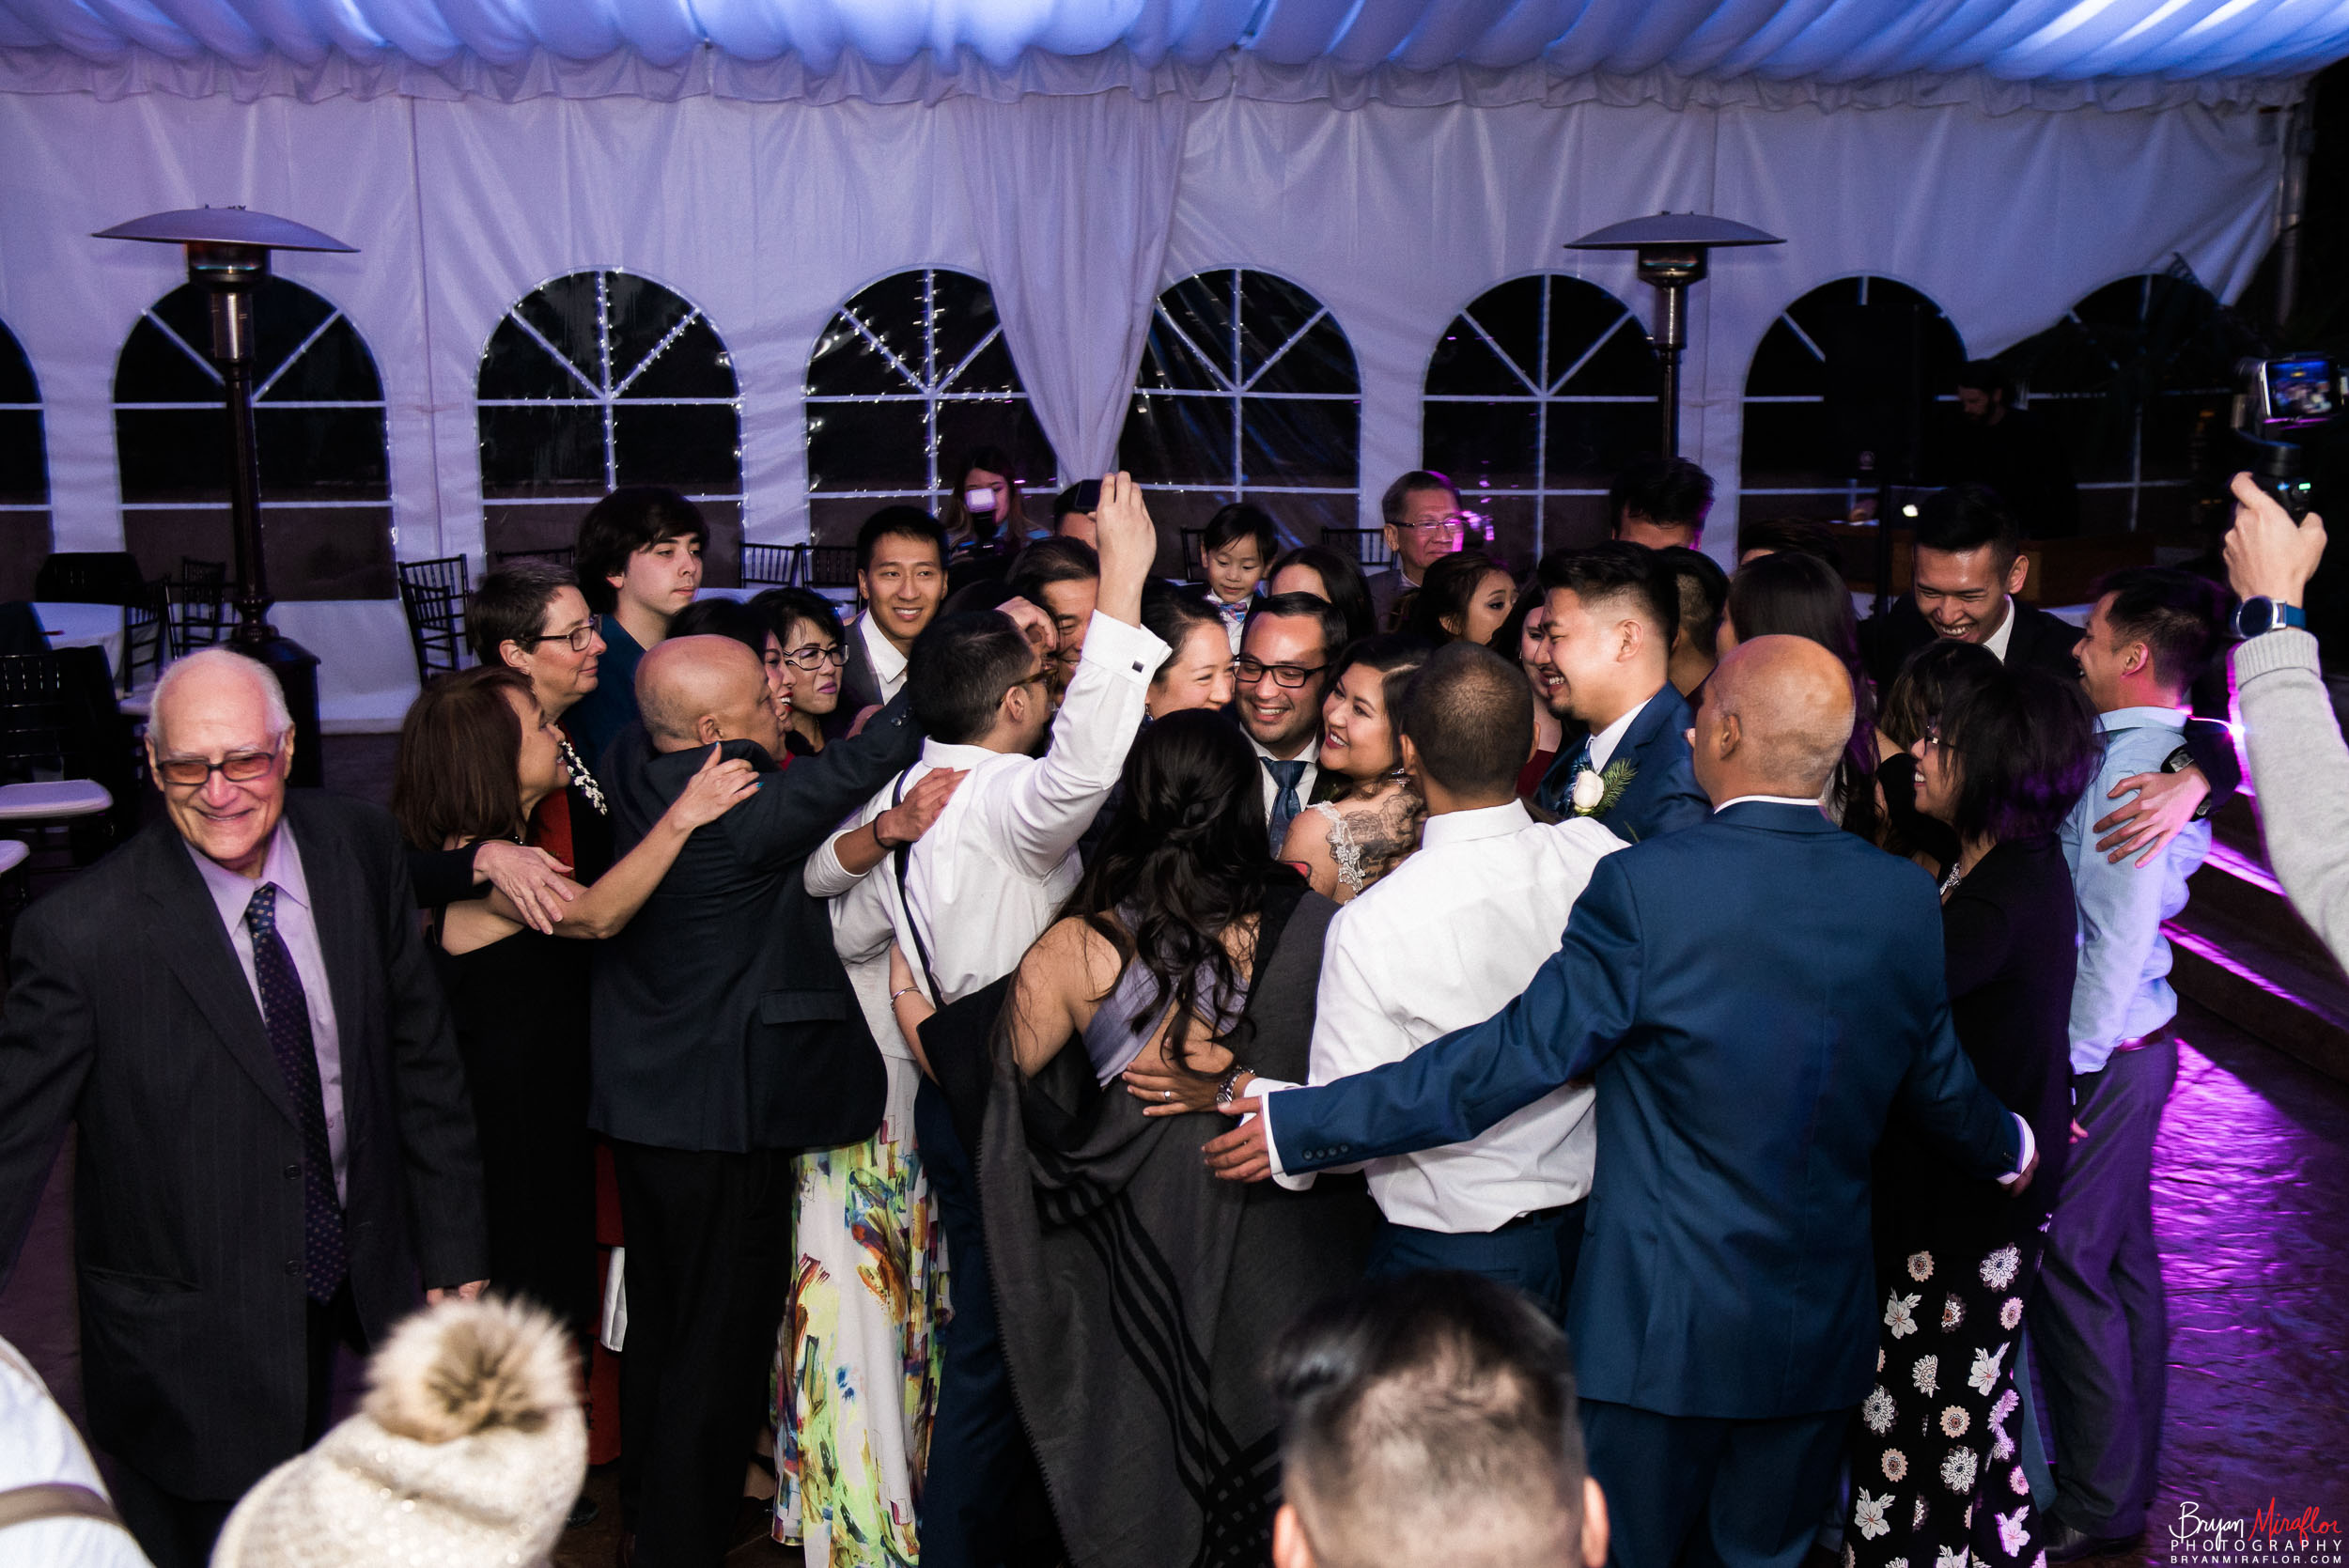 Bryan-Miraflor-Photography-Hannah-Jonathan-Married-Grand-Traditions-Estate-Gardens-Fallbrook-20171222-225.jpg